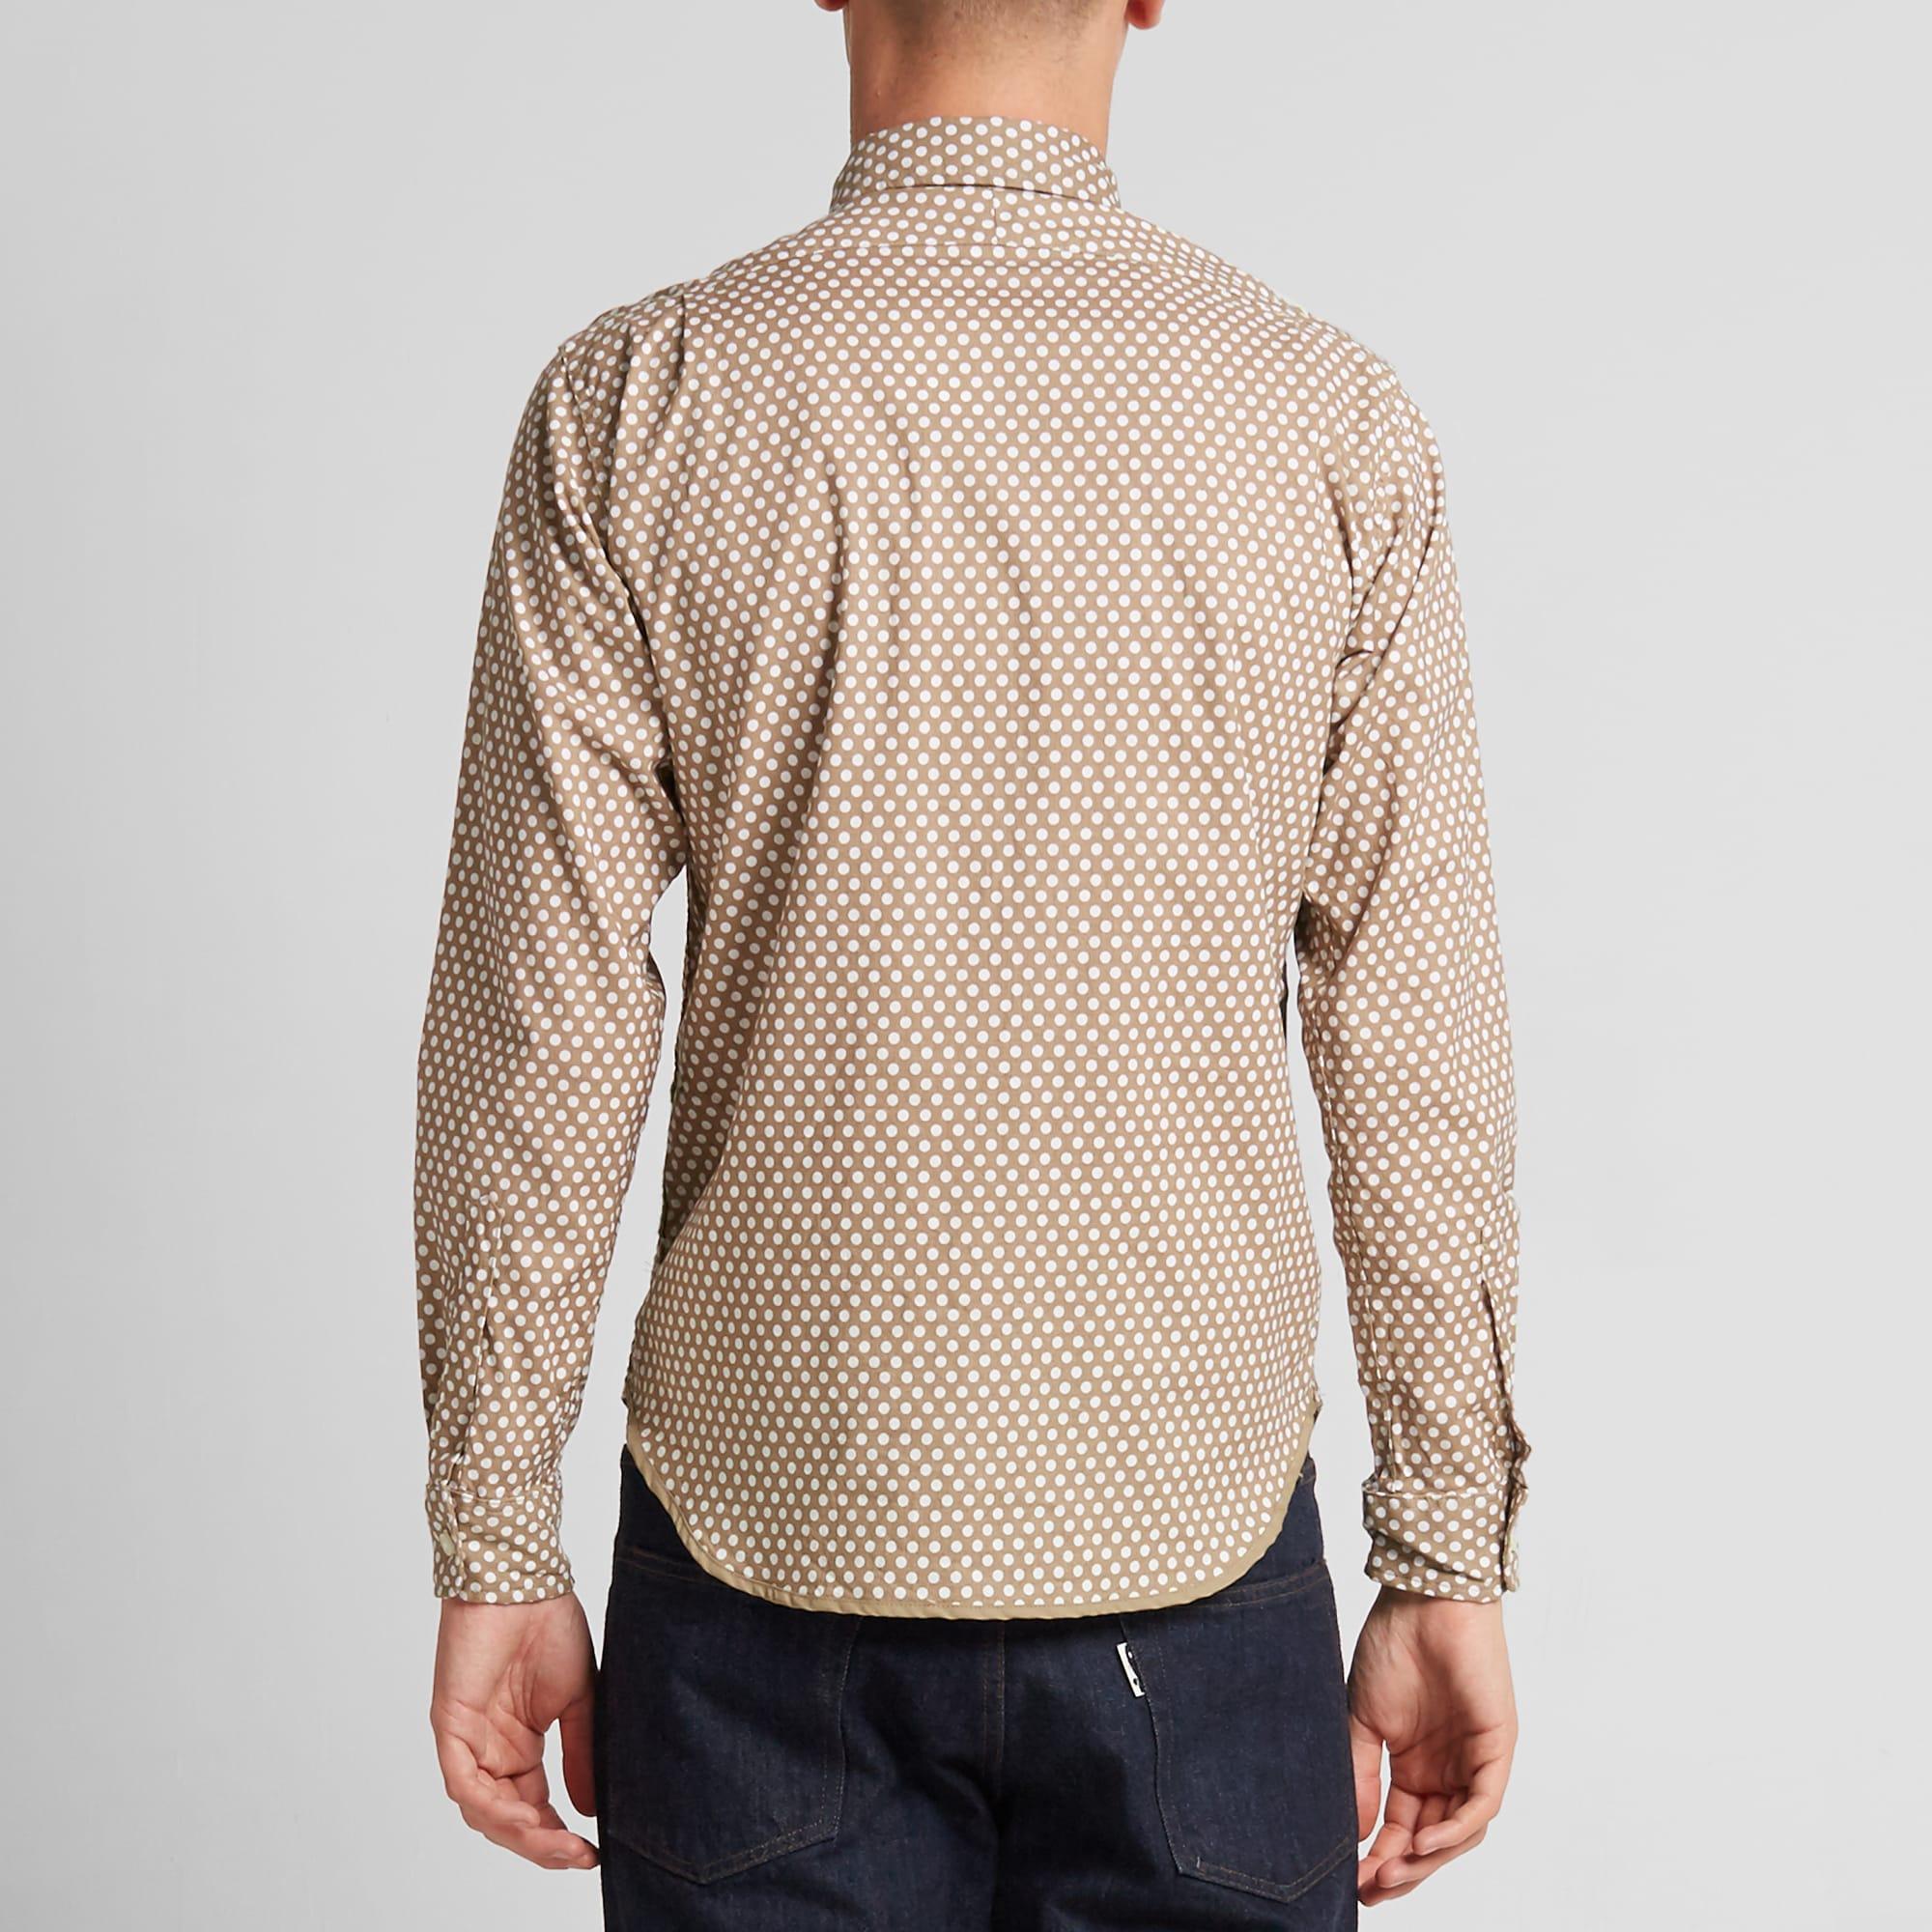 Rough & Tumble Polka Dot Panel Shirt